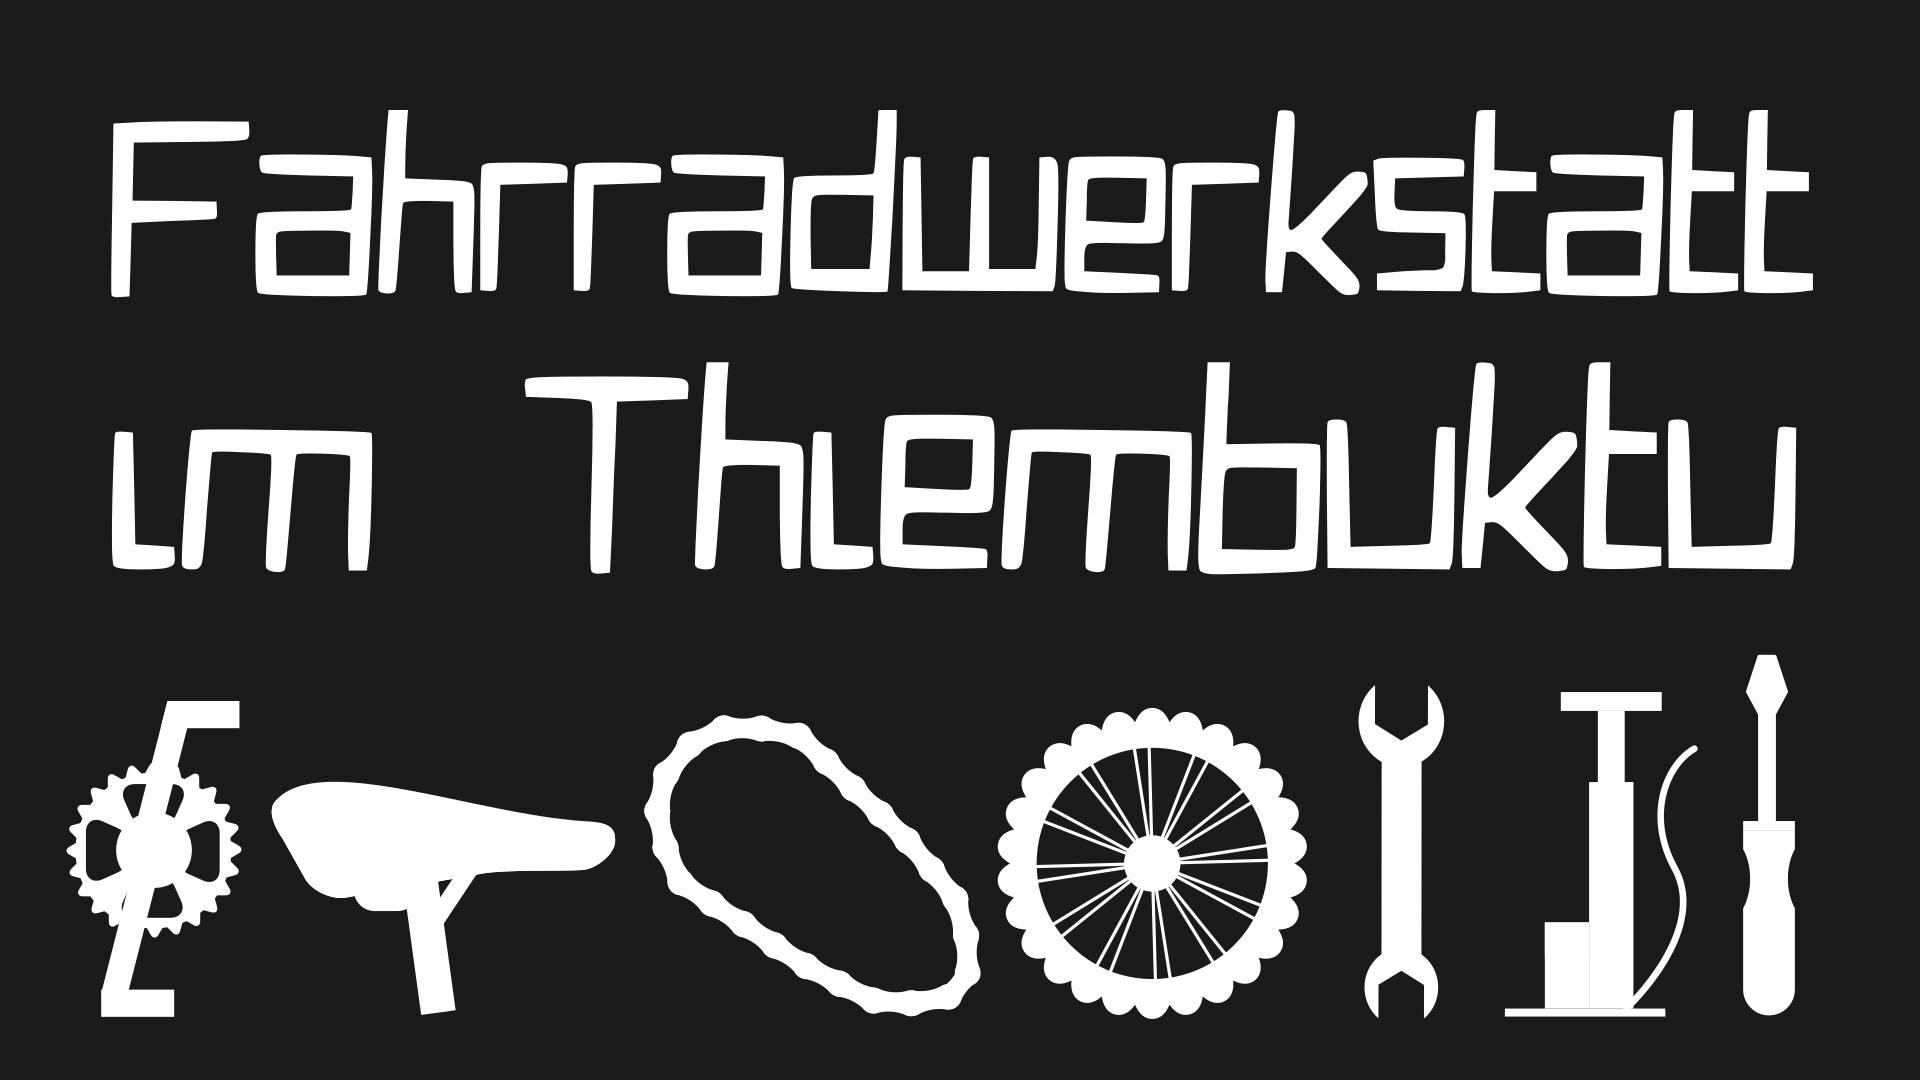 fahrrad selbsthilfe werkstatt diy bicycle repair workshop lkj sachsen anhalt e v